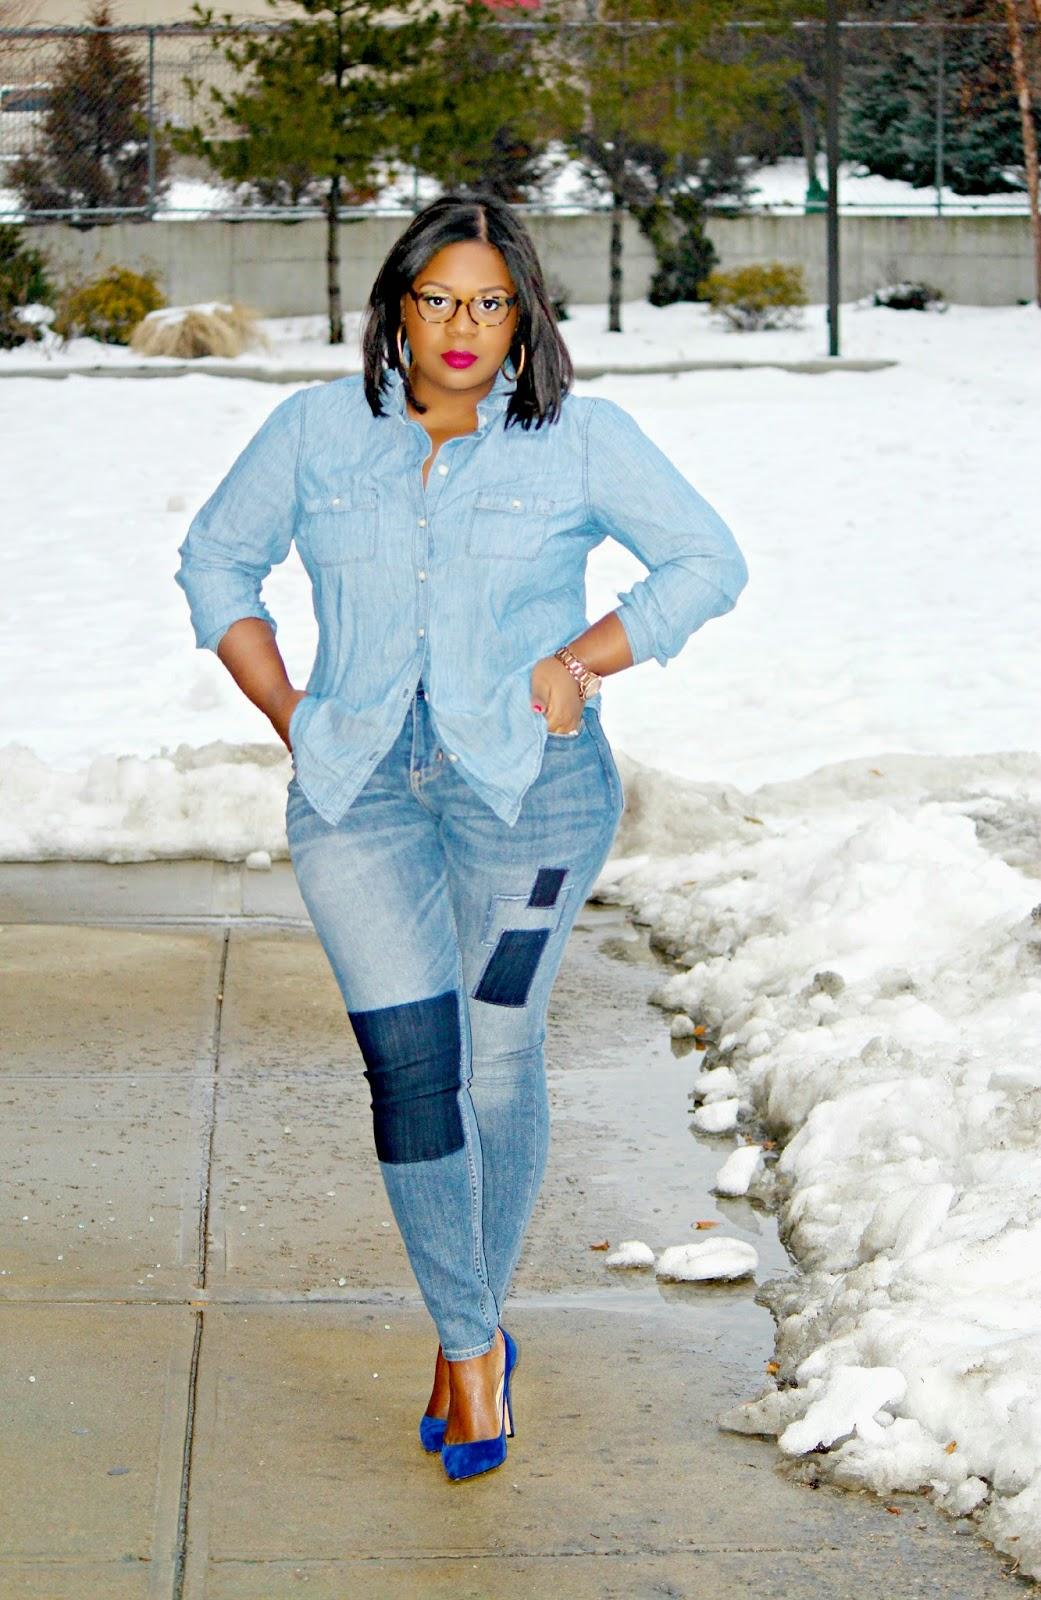 h&m knee patch skinny jeans, IRO Sydrae Pumps